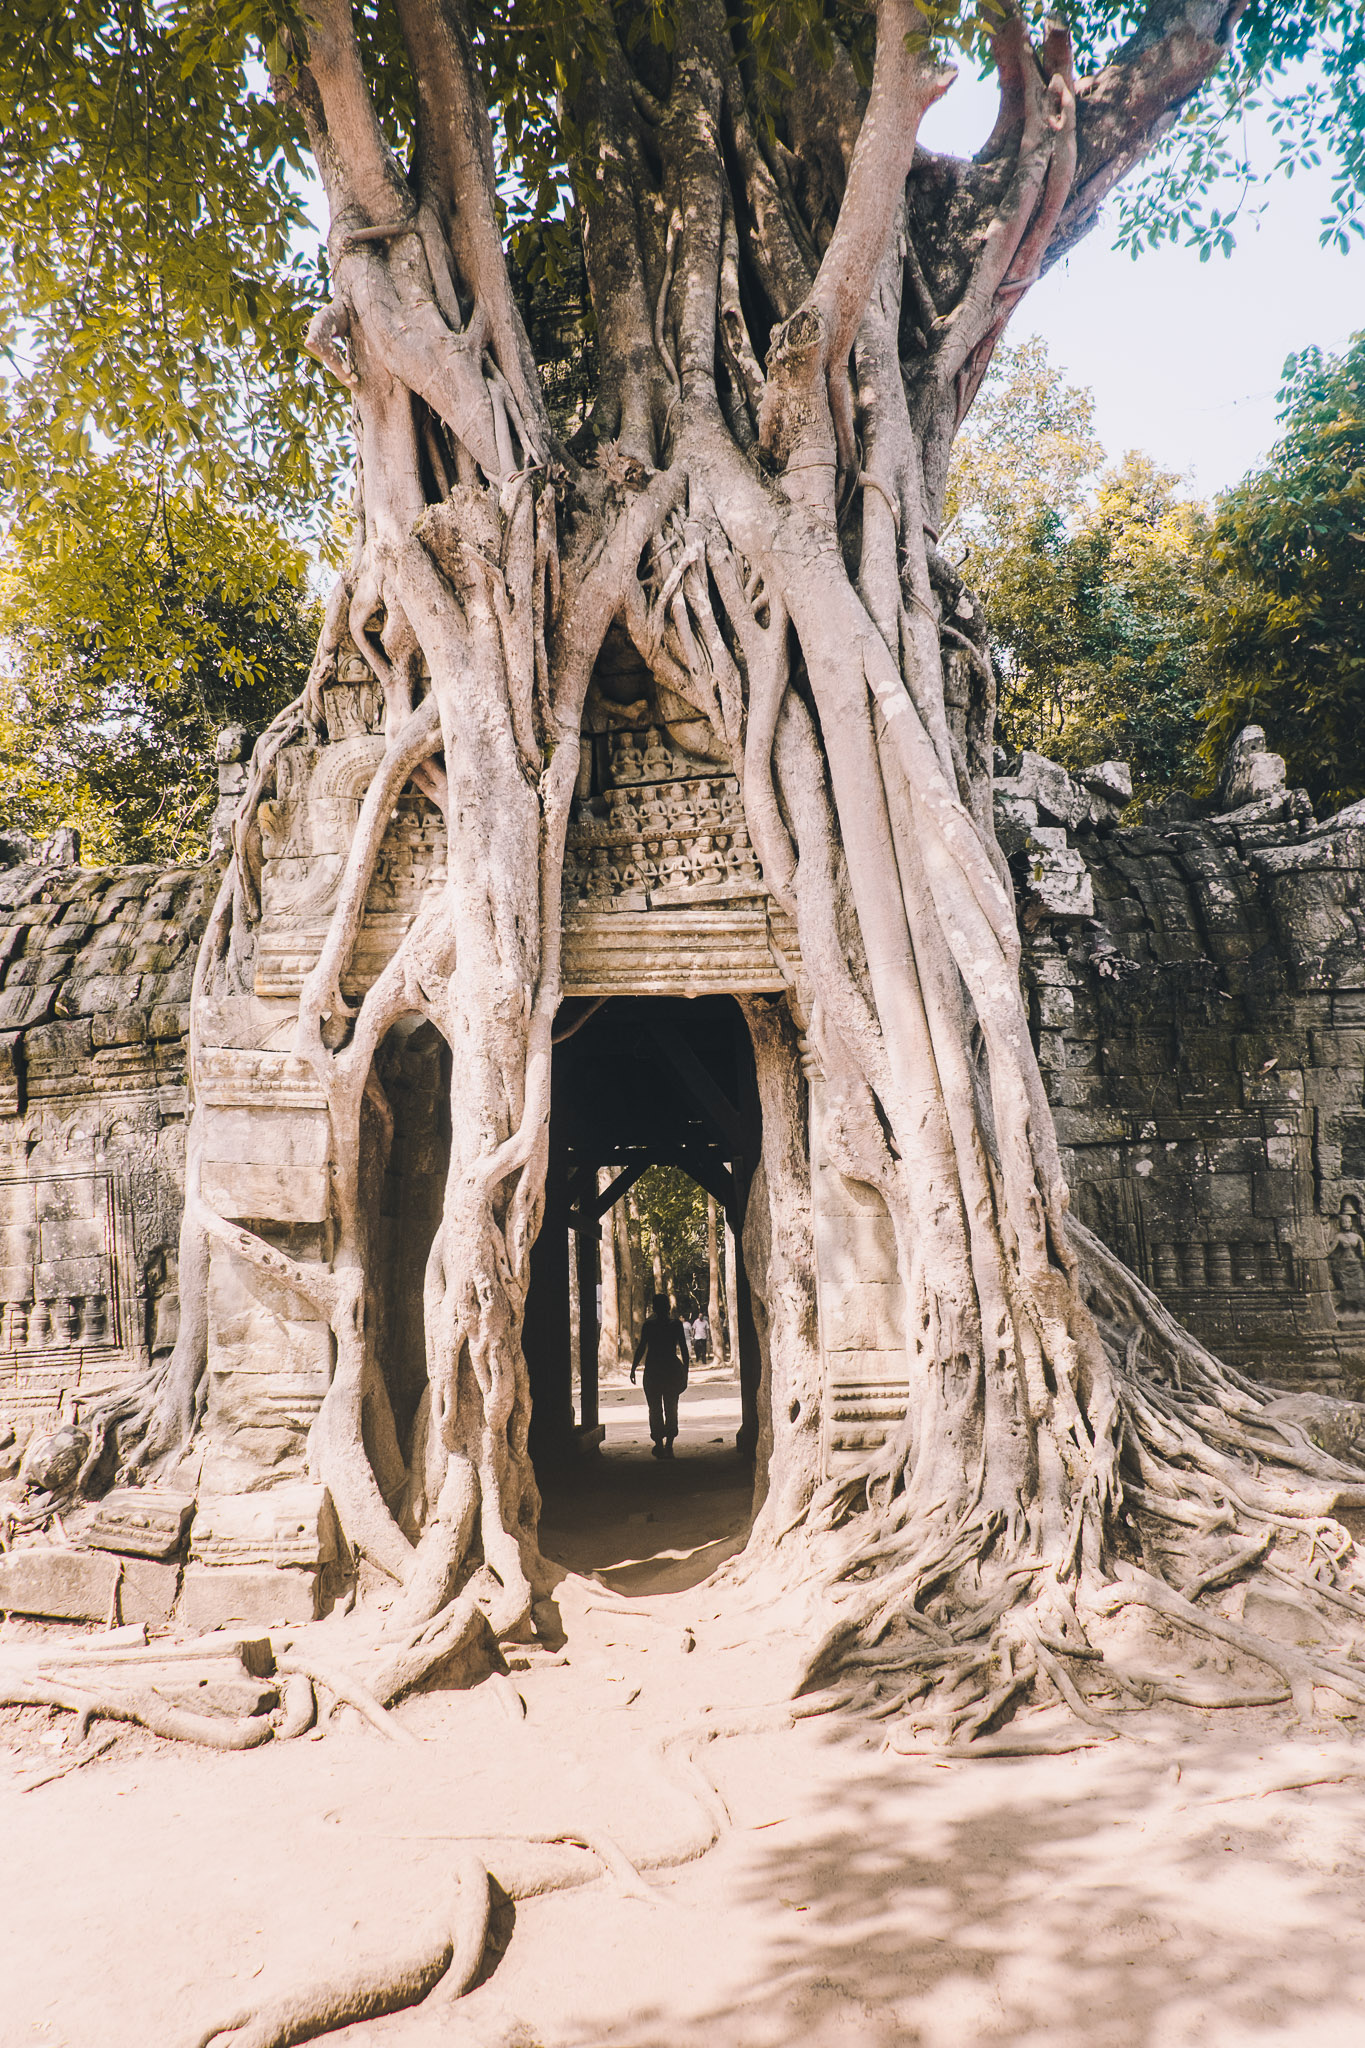 cambodia-siem-reap-temple-7.jpg